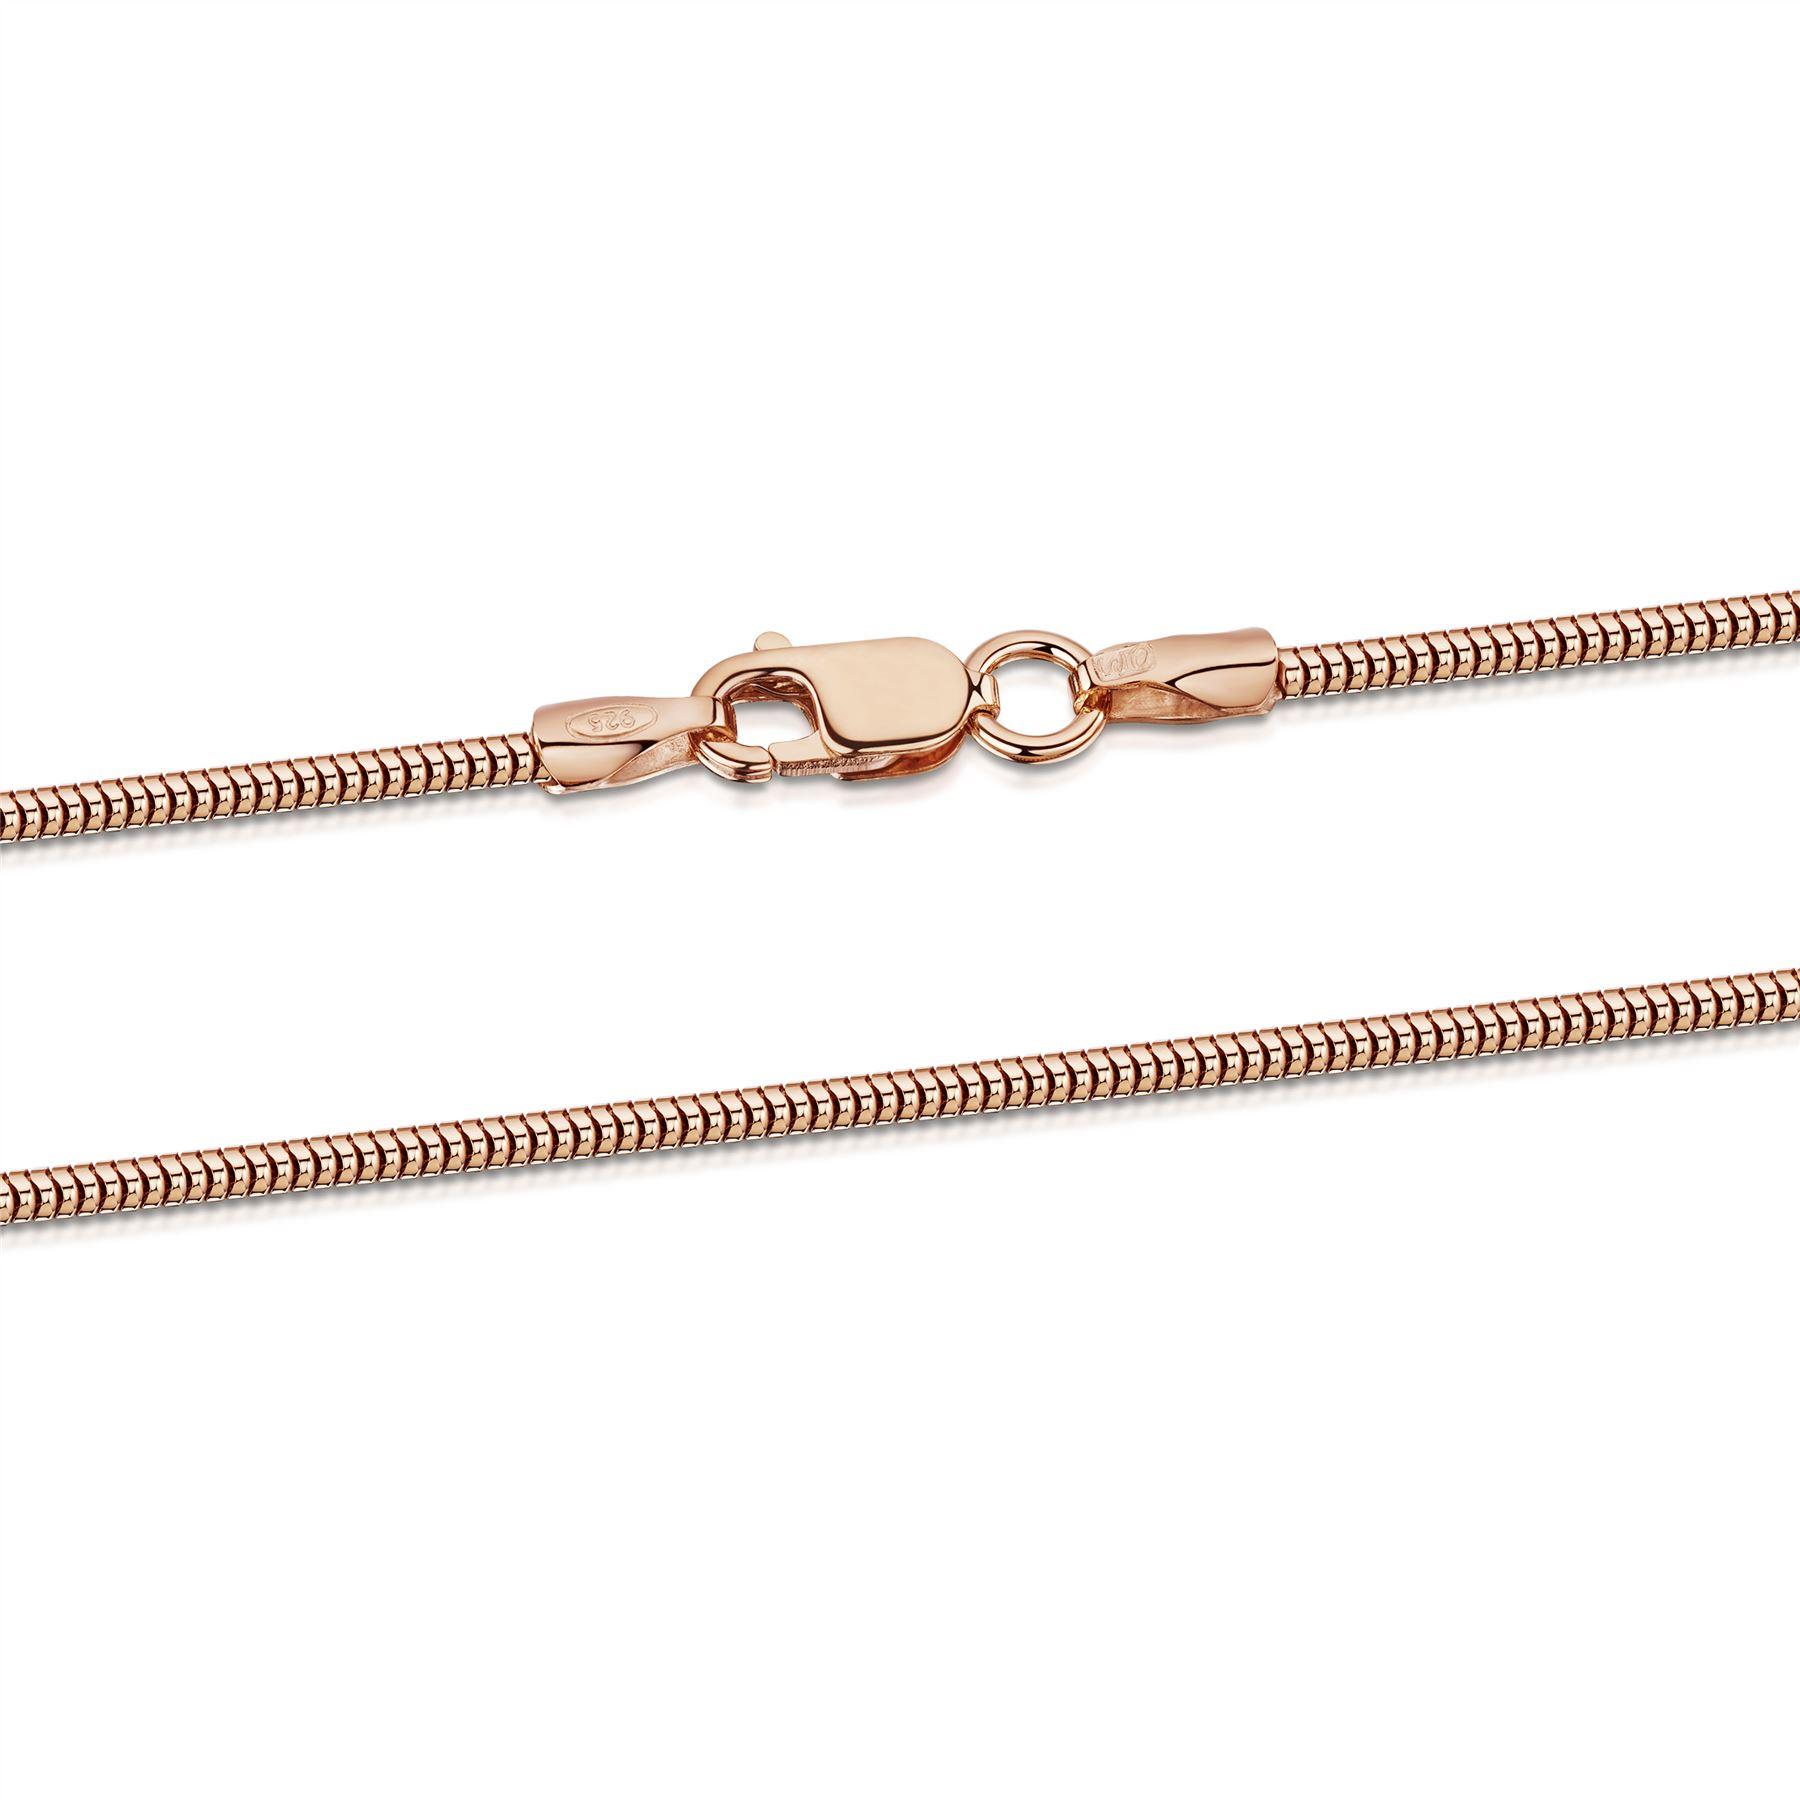 1.4 mm Snake Chain